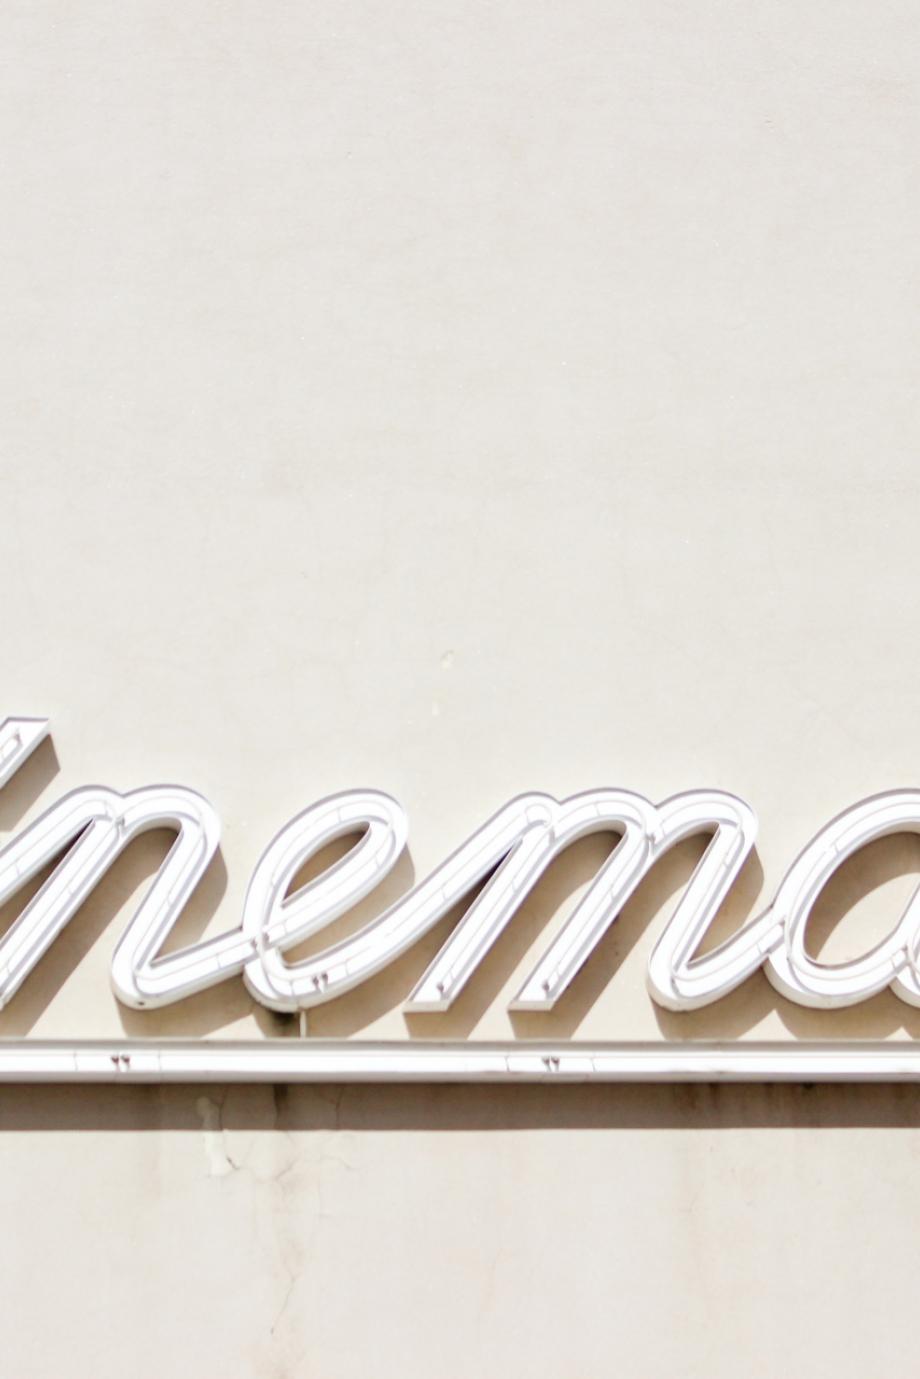 lisboa_cool_visitar_cinemateca